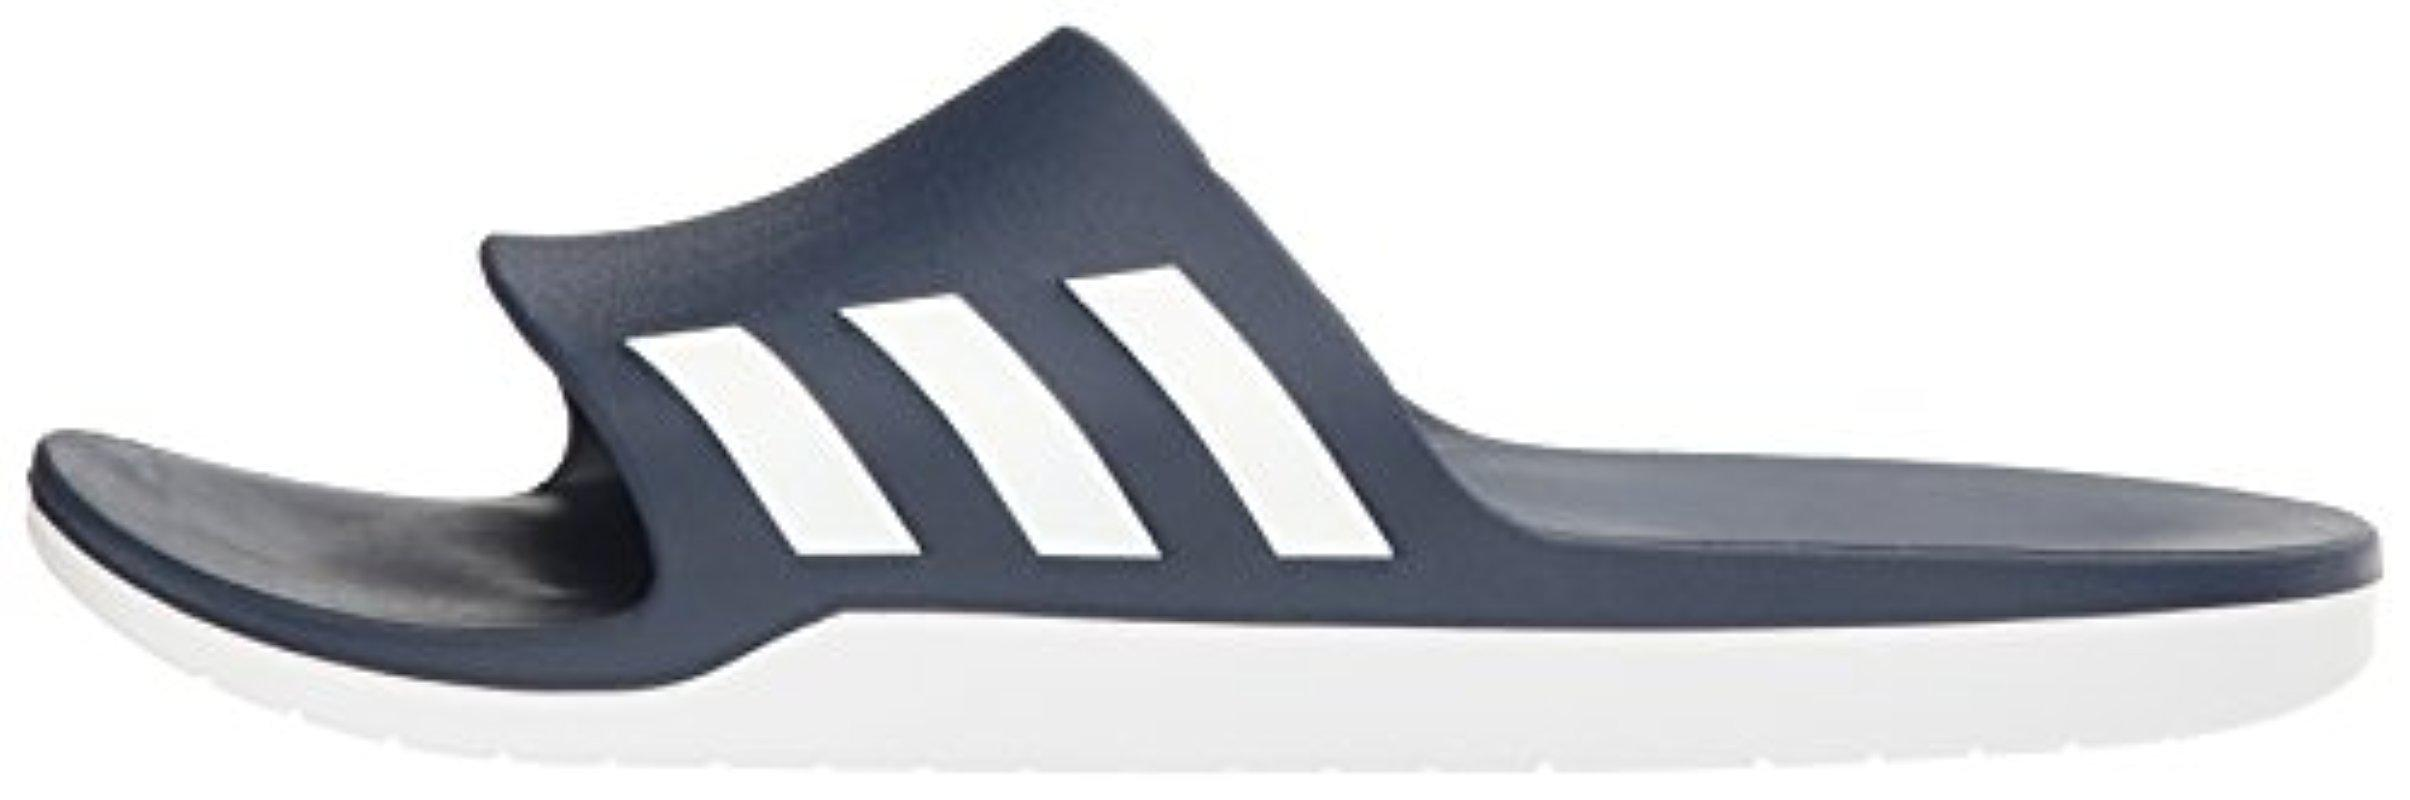 adidas Originals Adidas Aqualette Cf